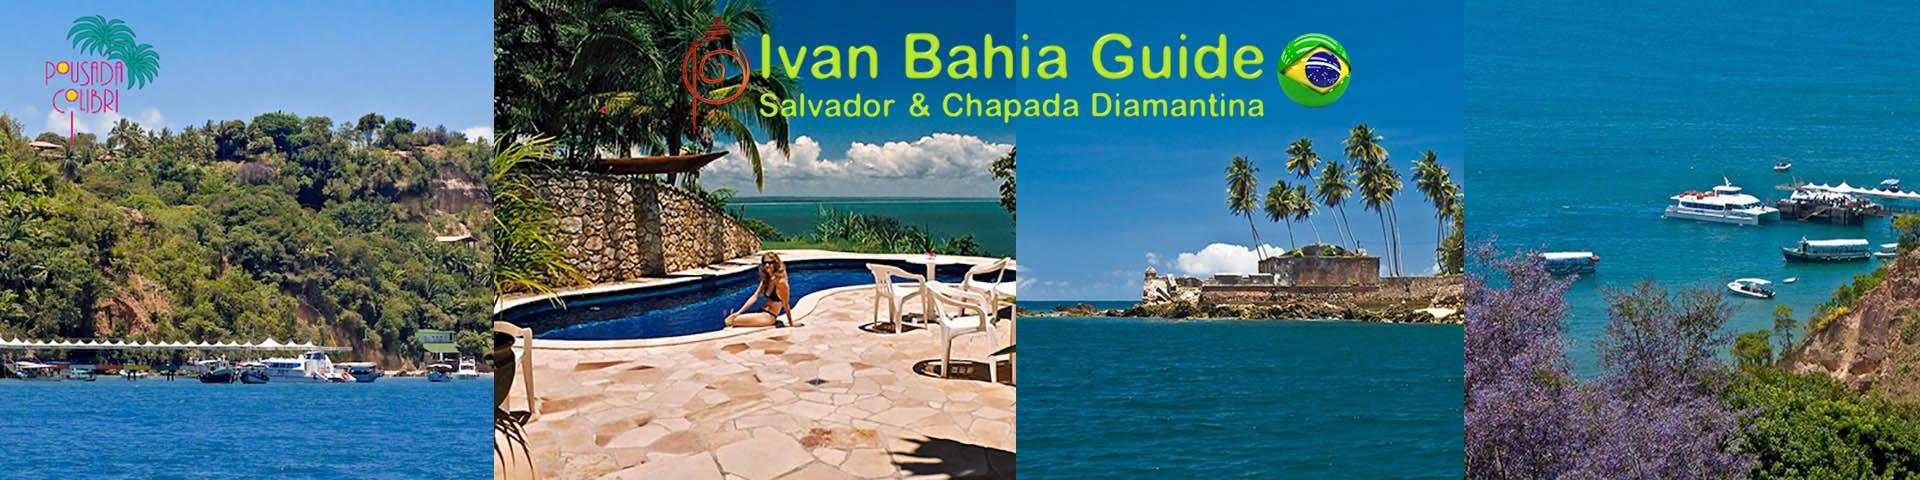 Ivan Bahia Guide - daytour from Salvador : Chapada Diamantina National Park in 1 day